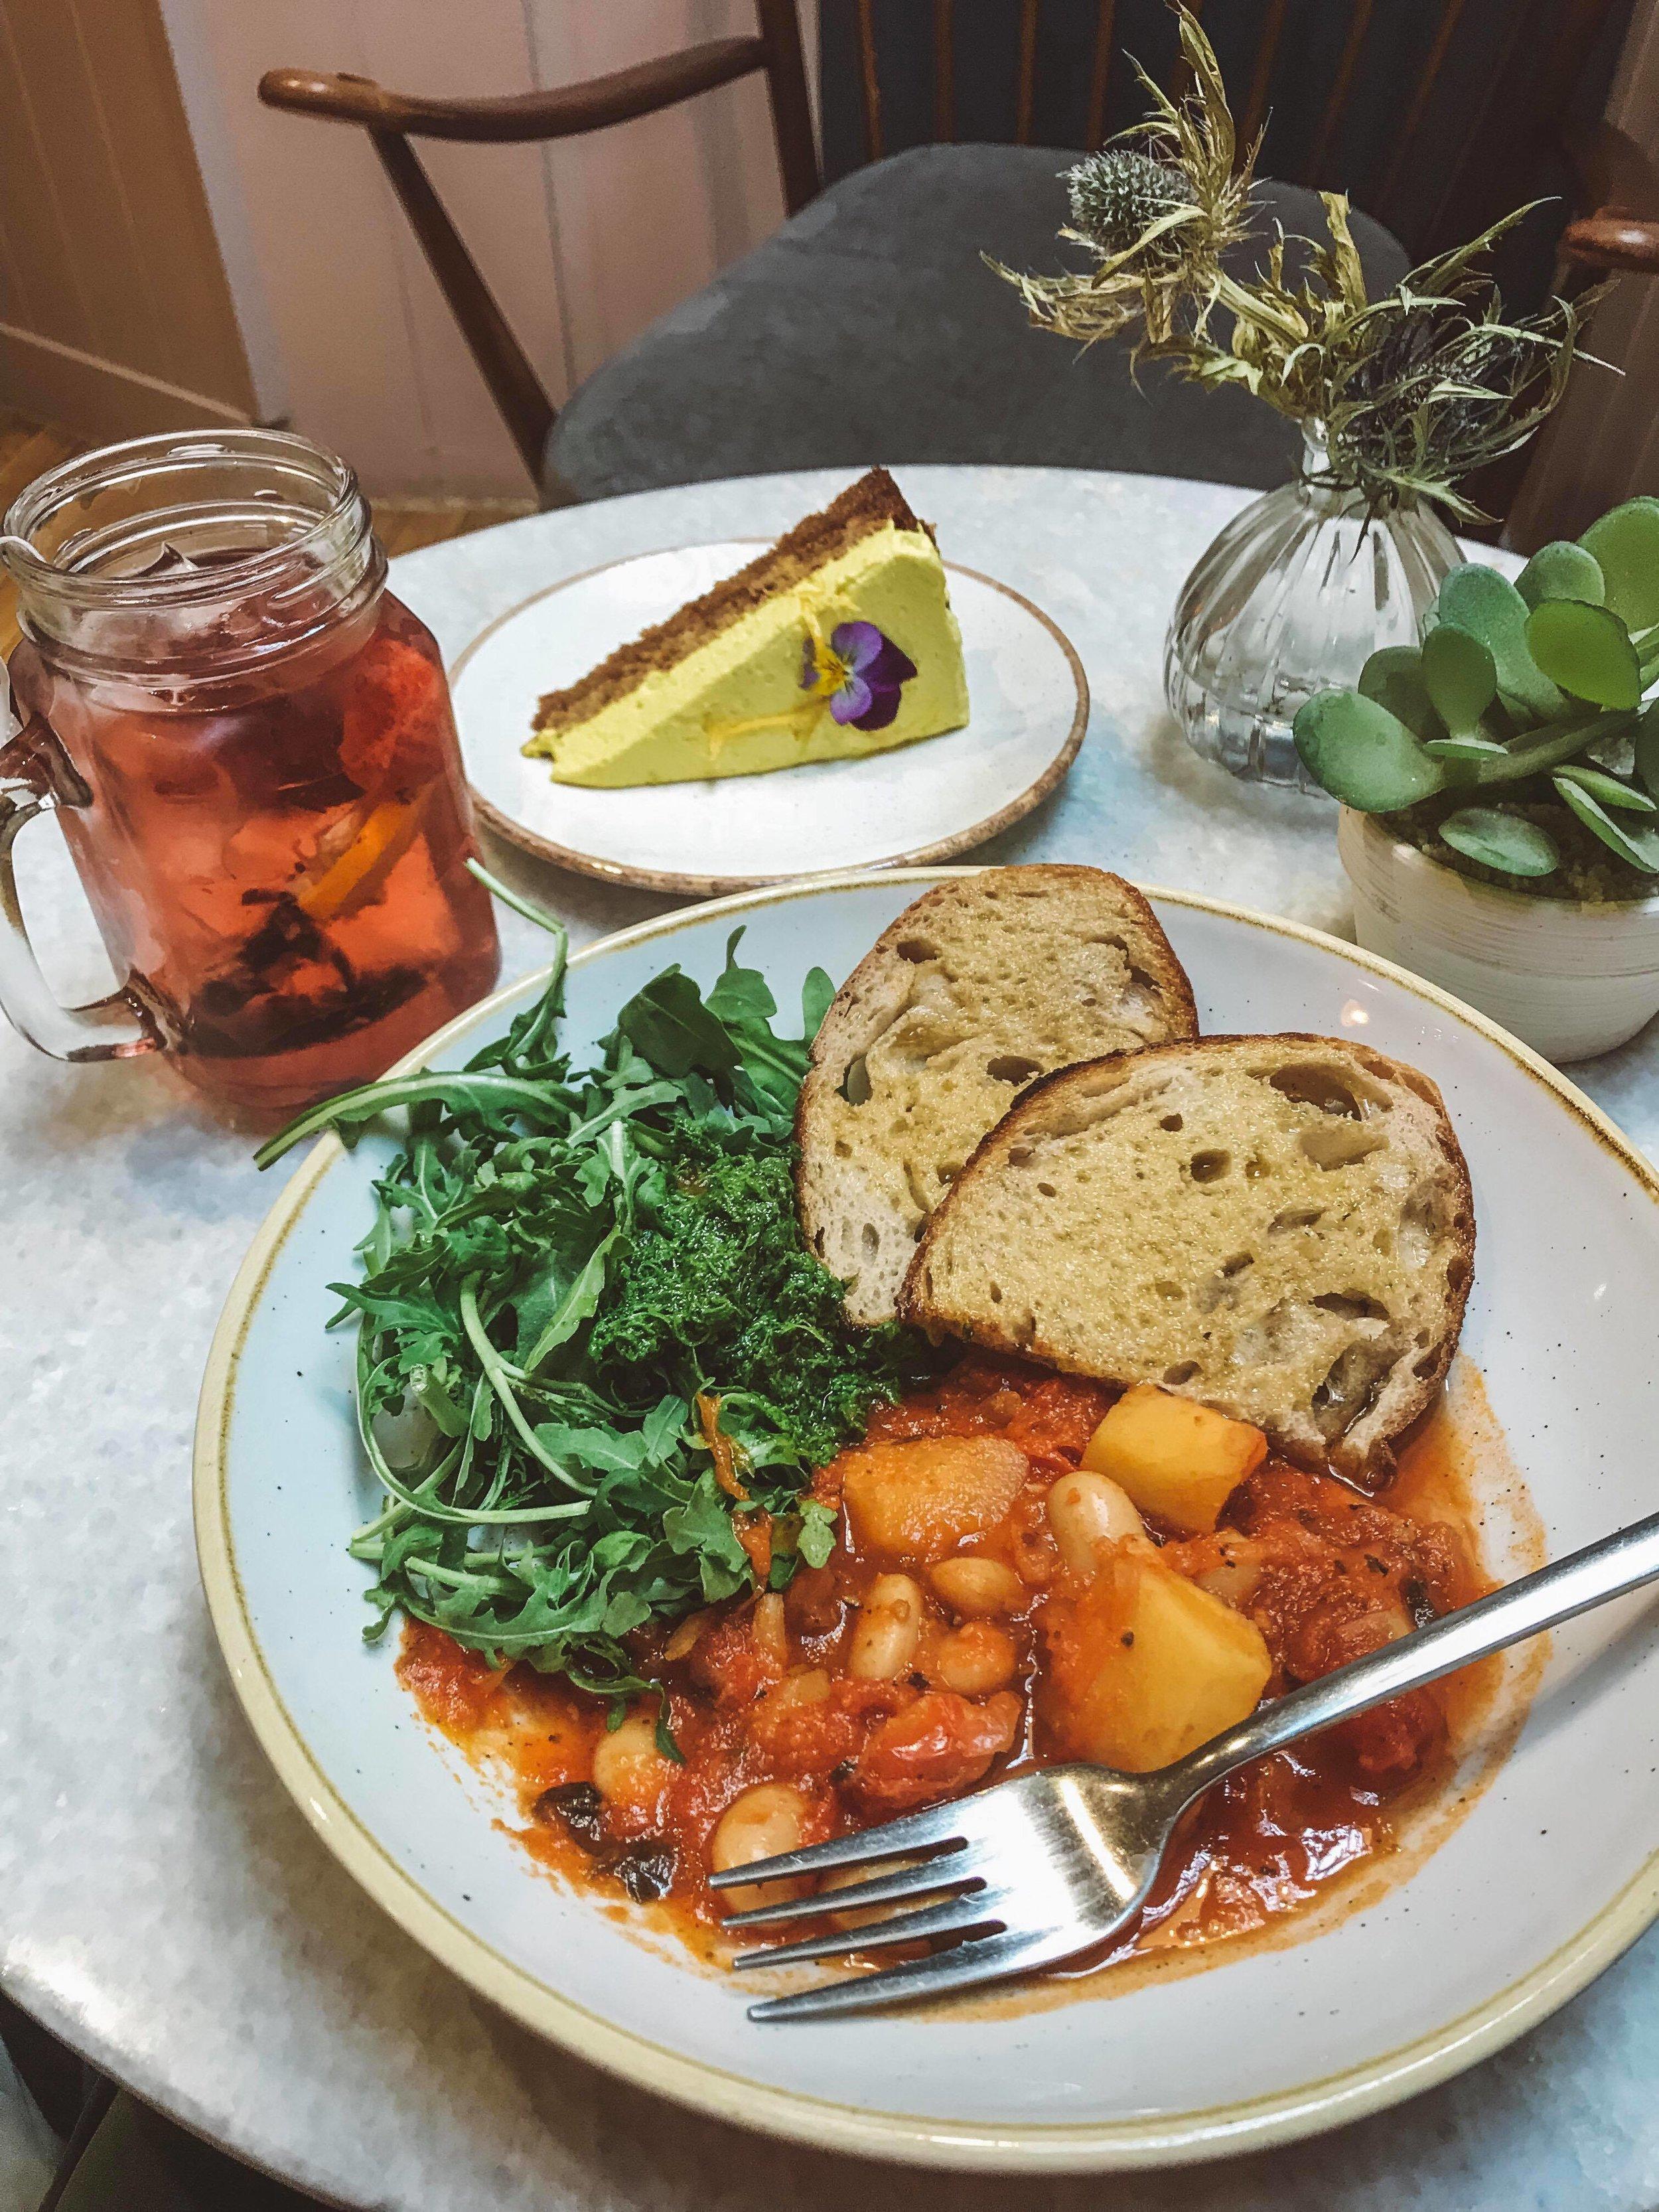 A glorious tuscan bean stew, lemon cake and iced tea.